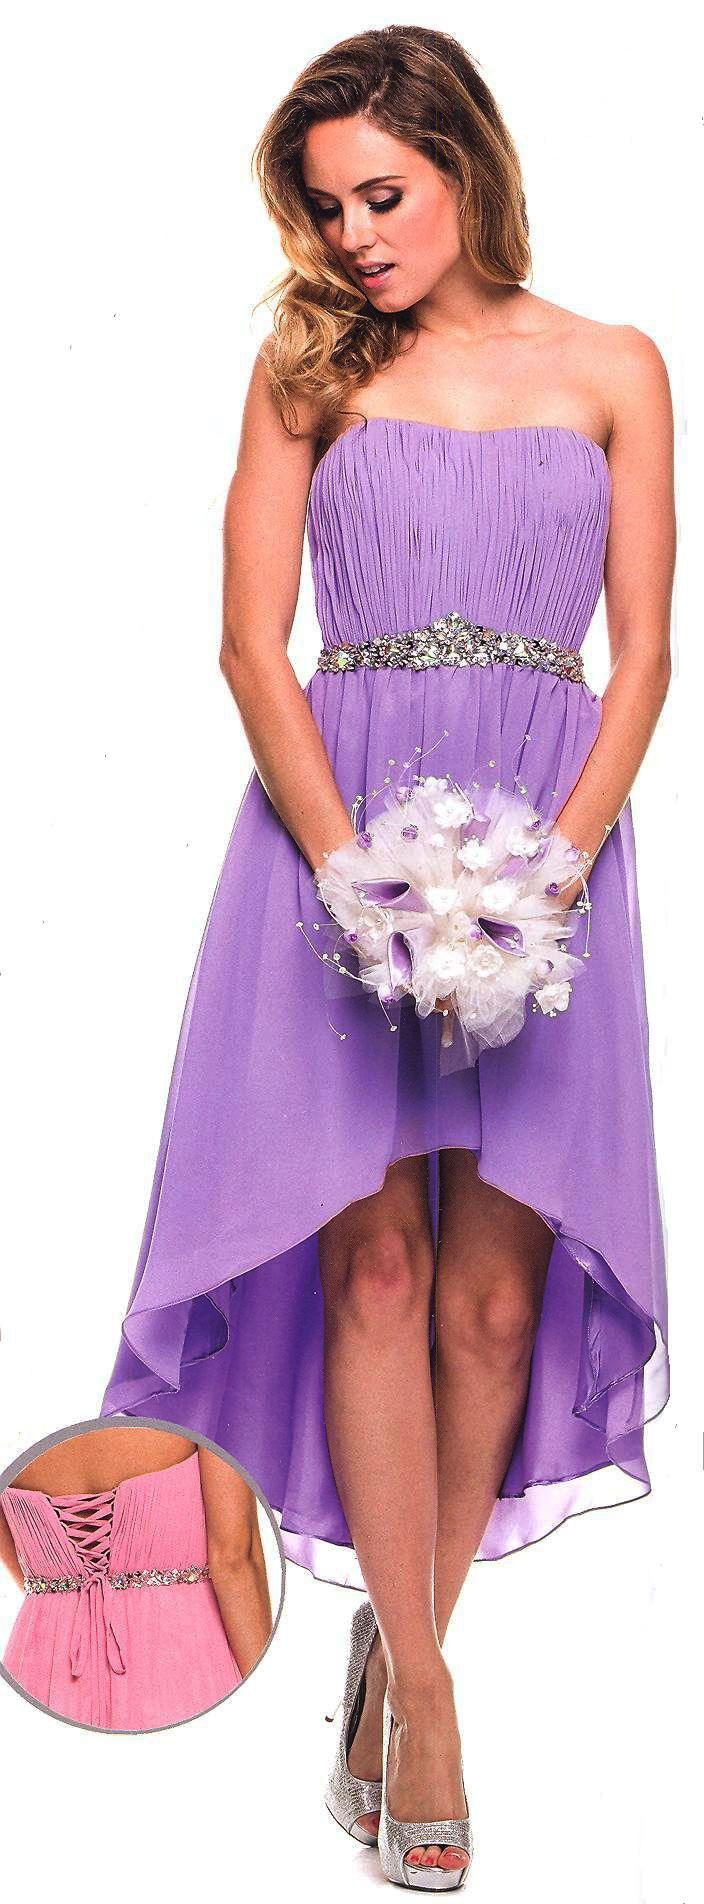 Purple Bridesmaid Dresses Under 100 Images - Braidsmaid Dress ...